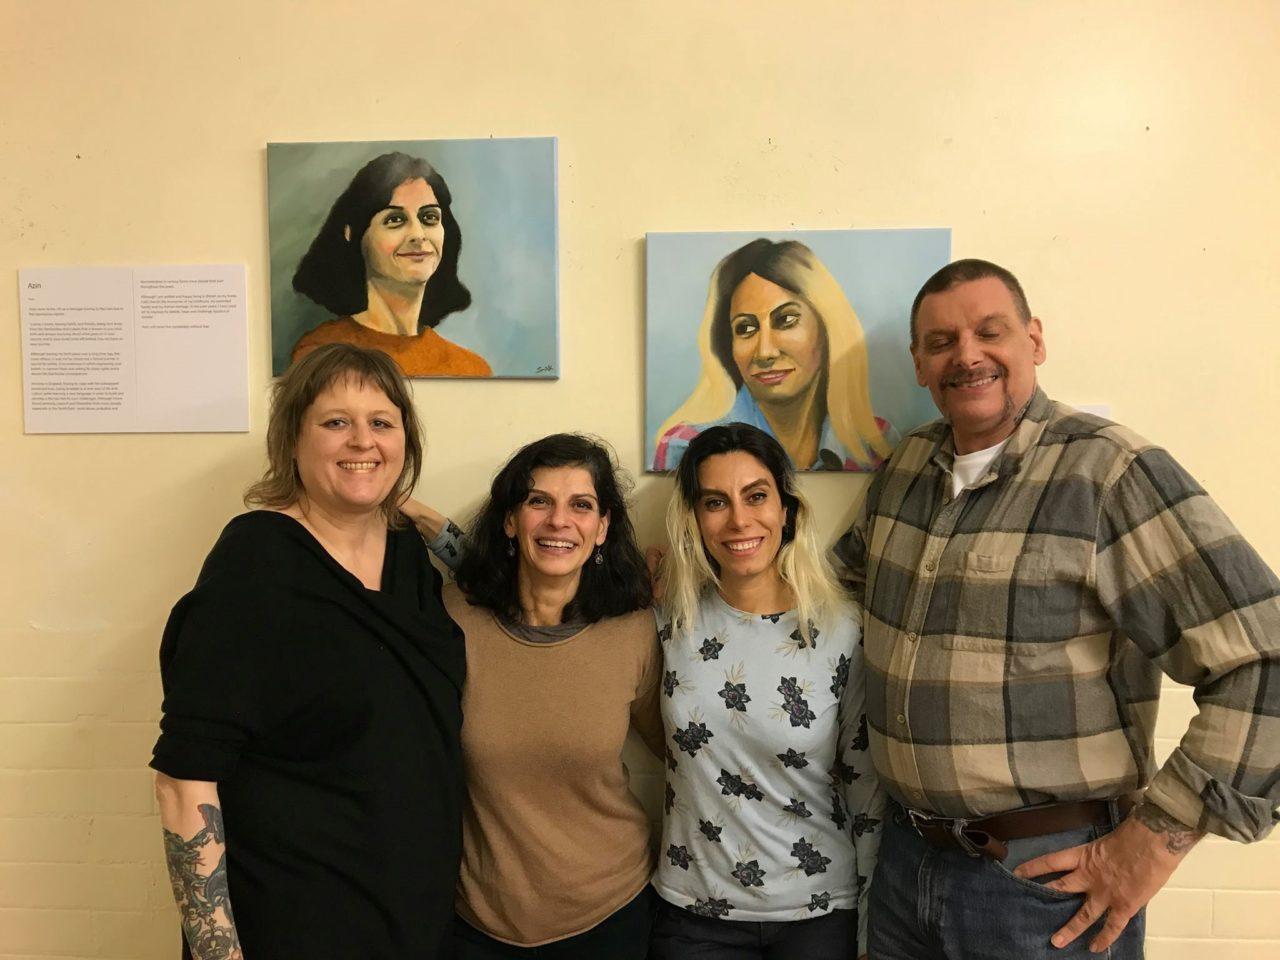 Community groups across Newcastle mark HMD 2019